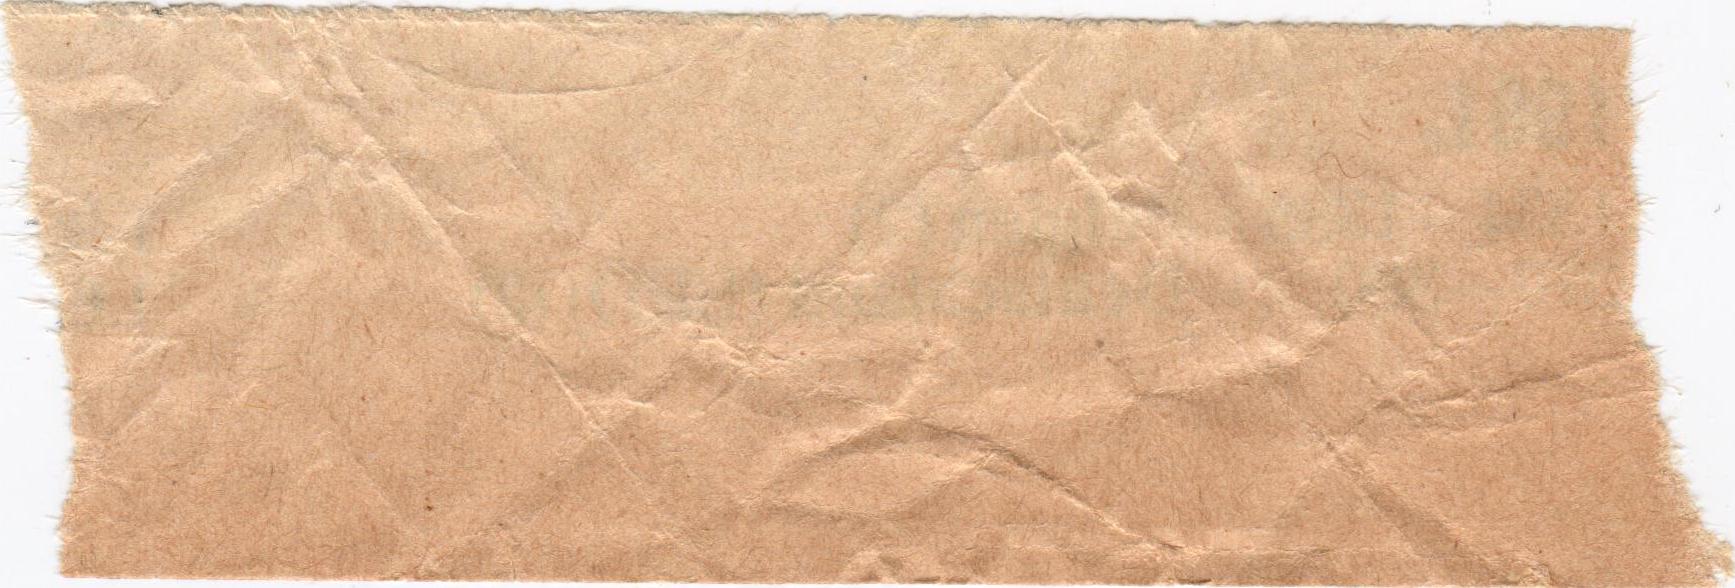 10 torn old paper banner png transparent onlygfxcom